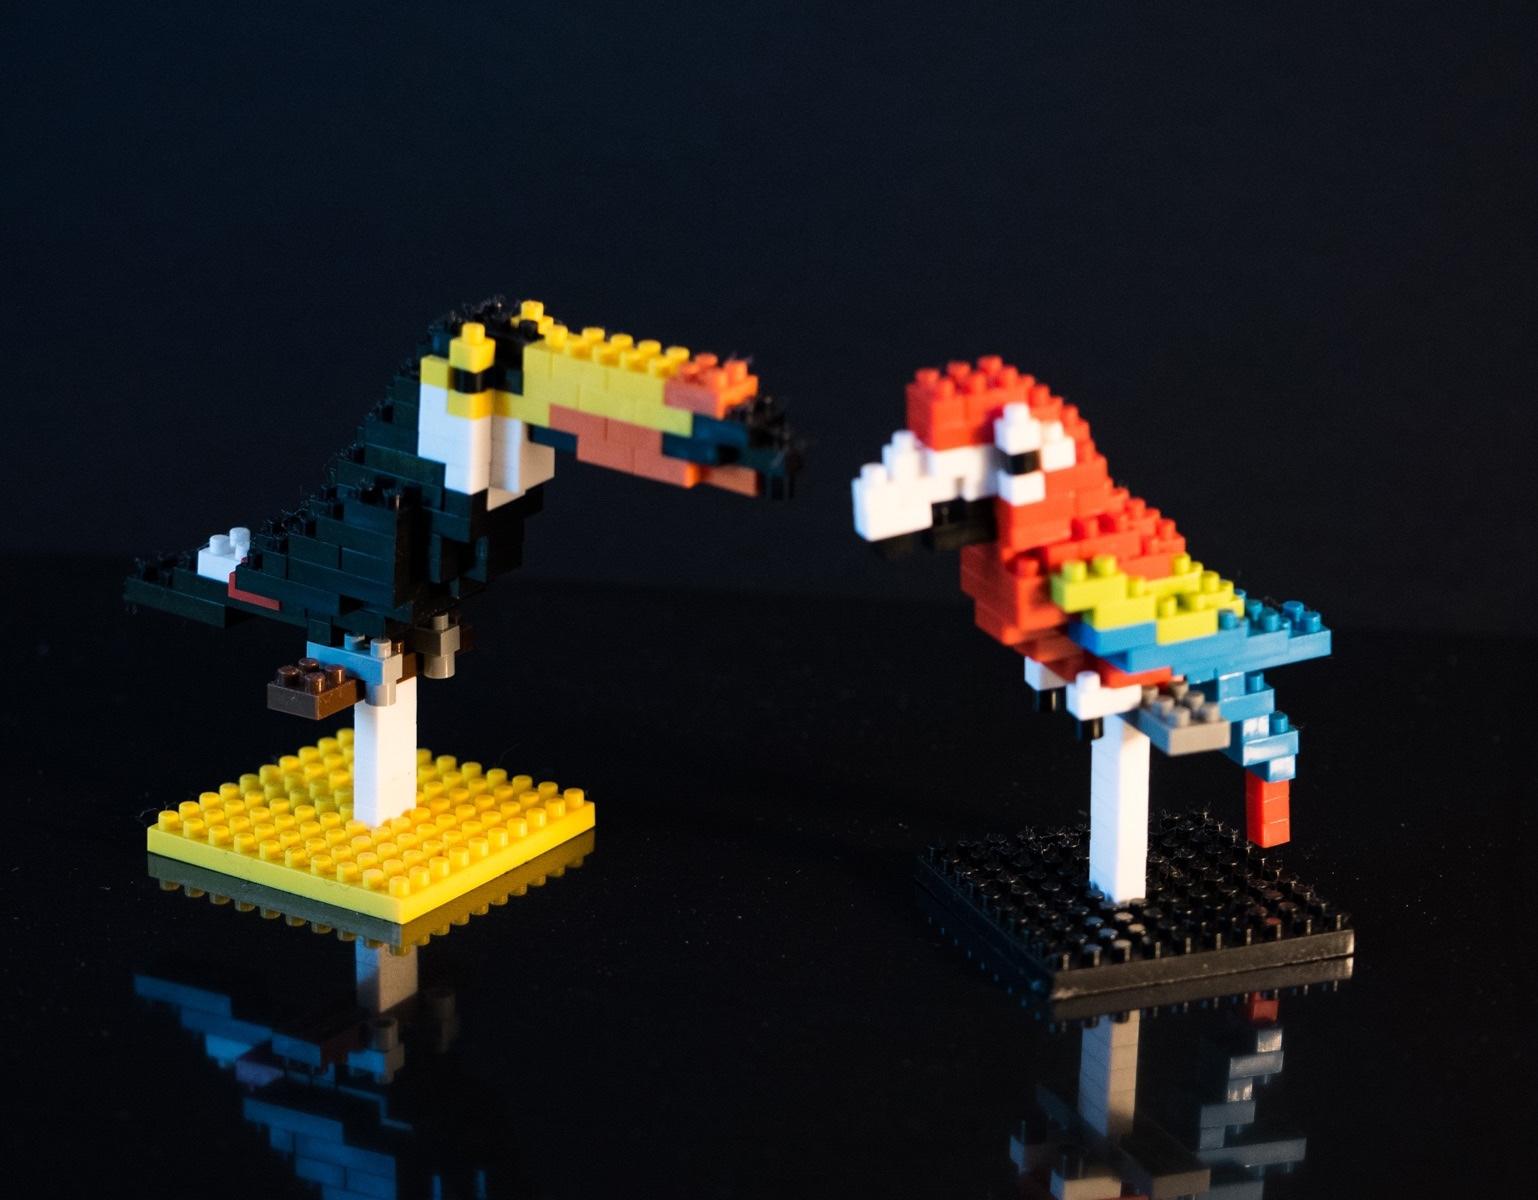 Tropical birds made fromnanoblocks